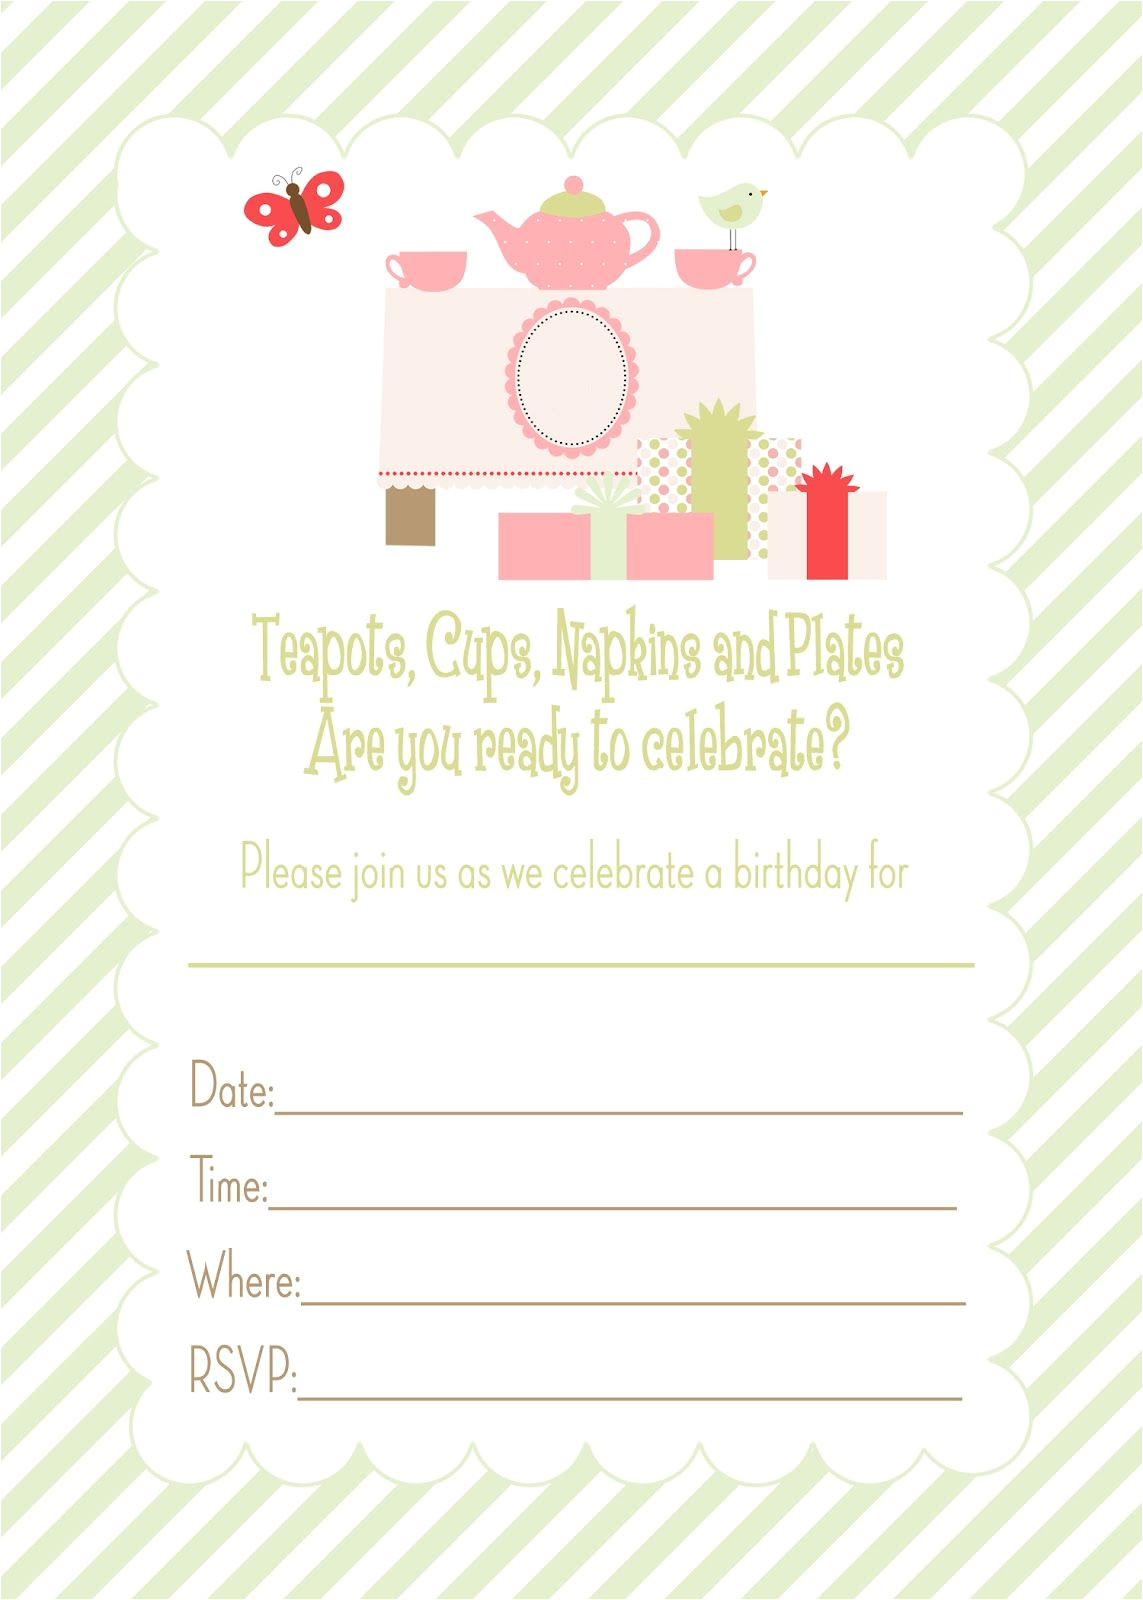 Party Invitation Template Worksheet Free Printable Tea Party Birthday Invitation Free